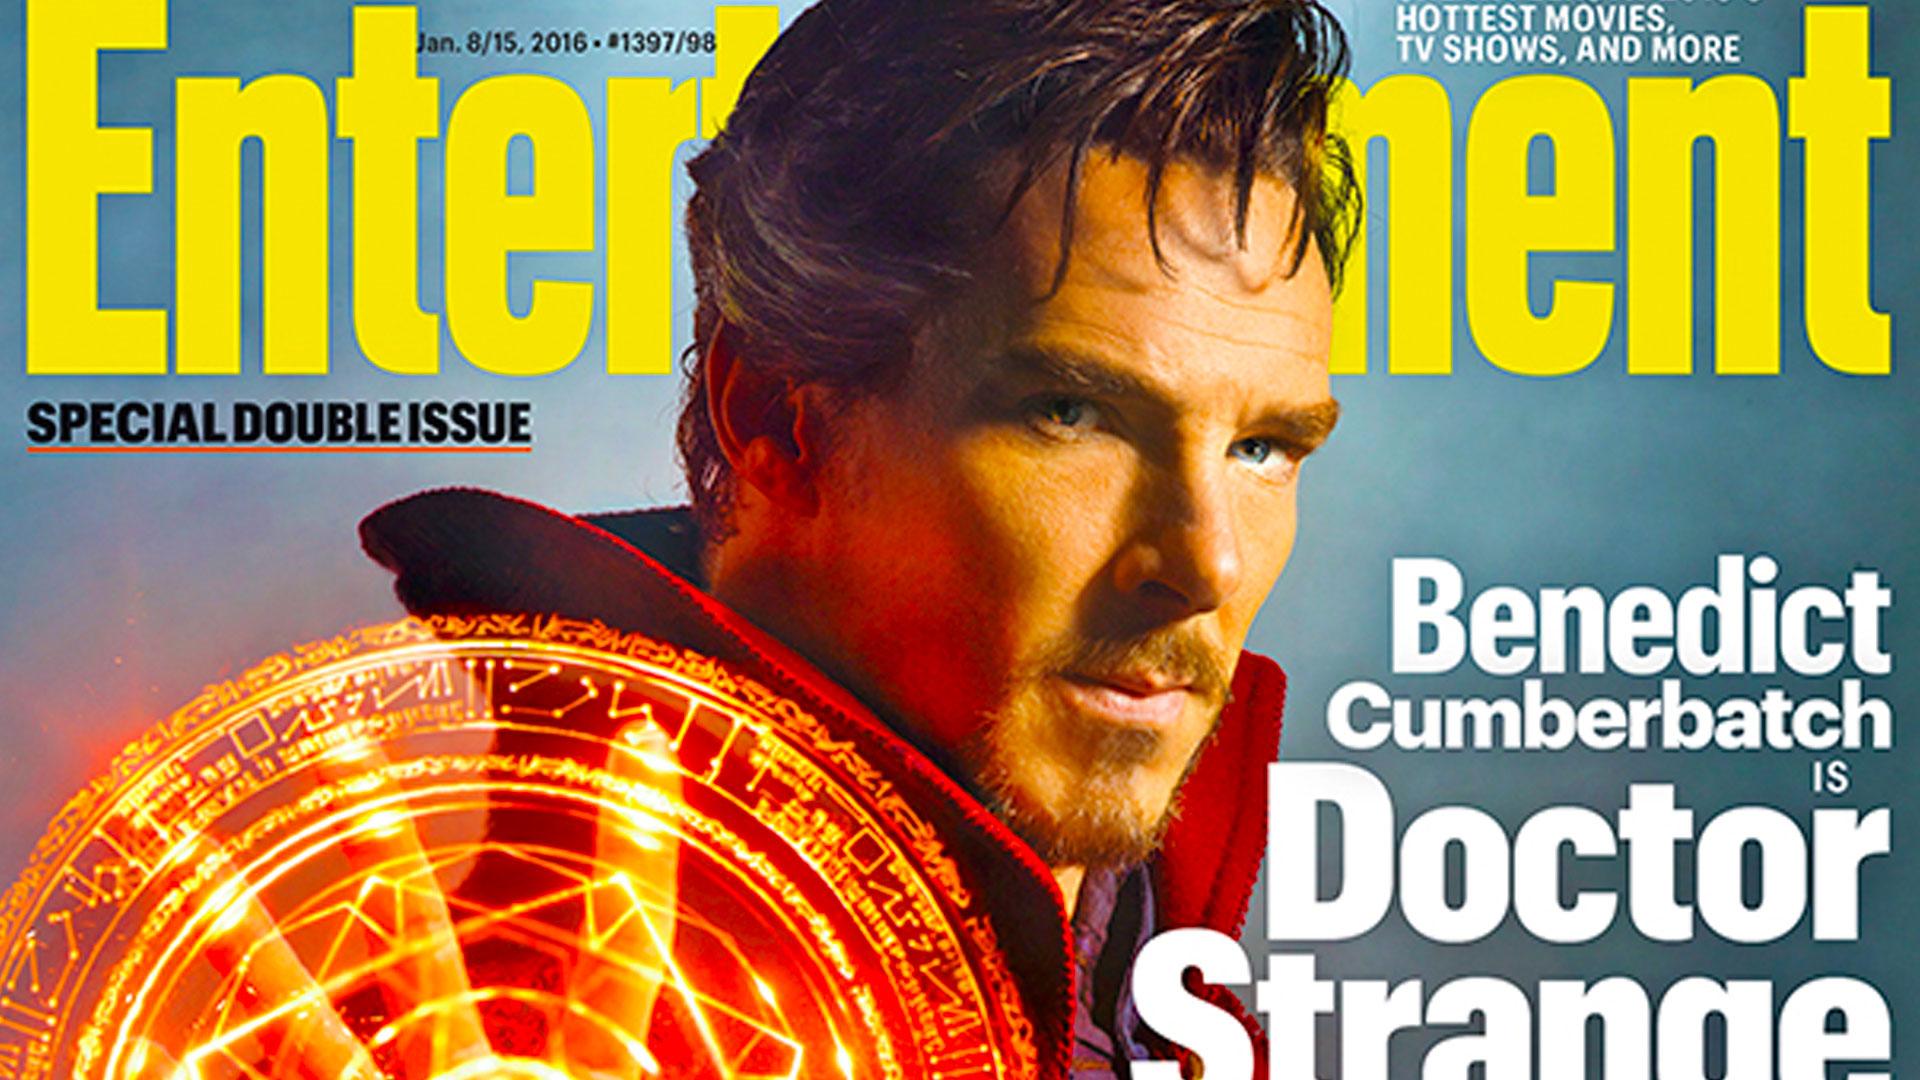 benedict cumberbatch doctor strange. marvel. entertainment weekly. entertainment on tap.